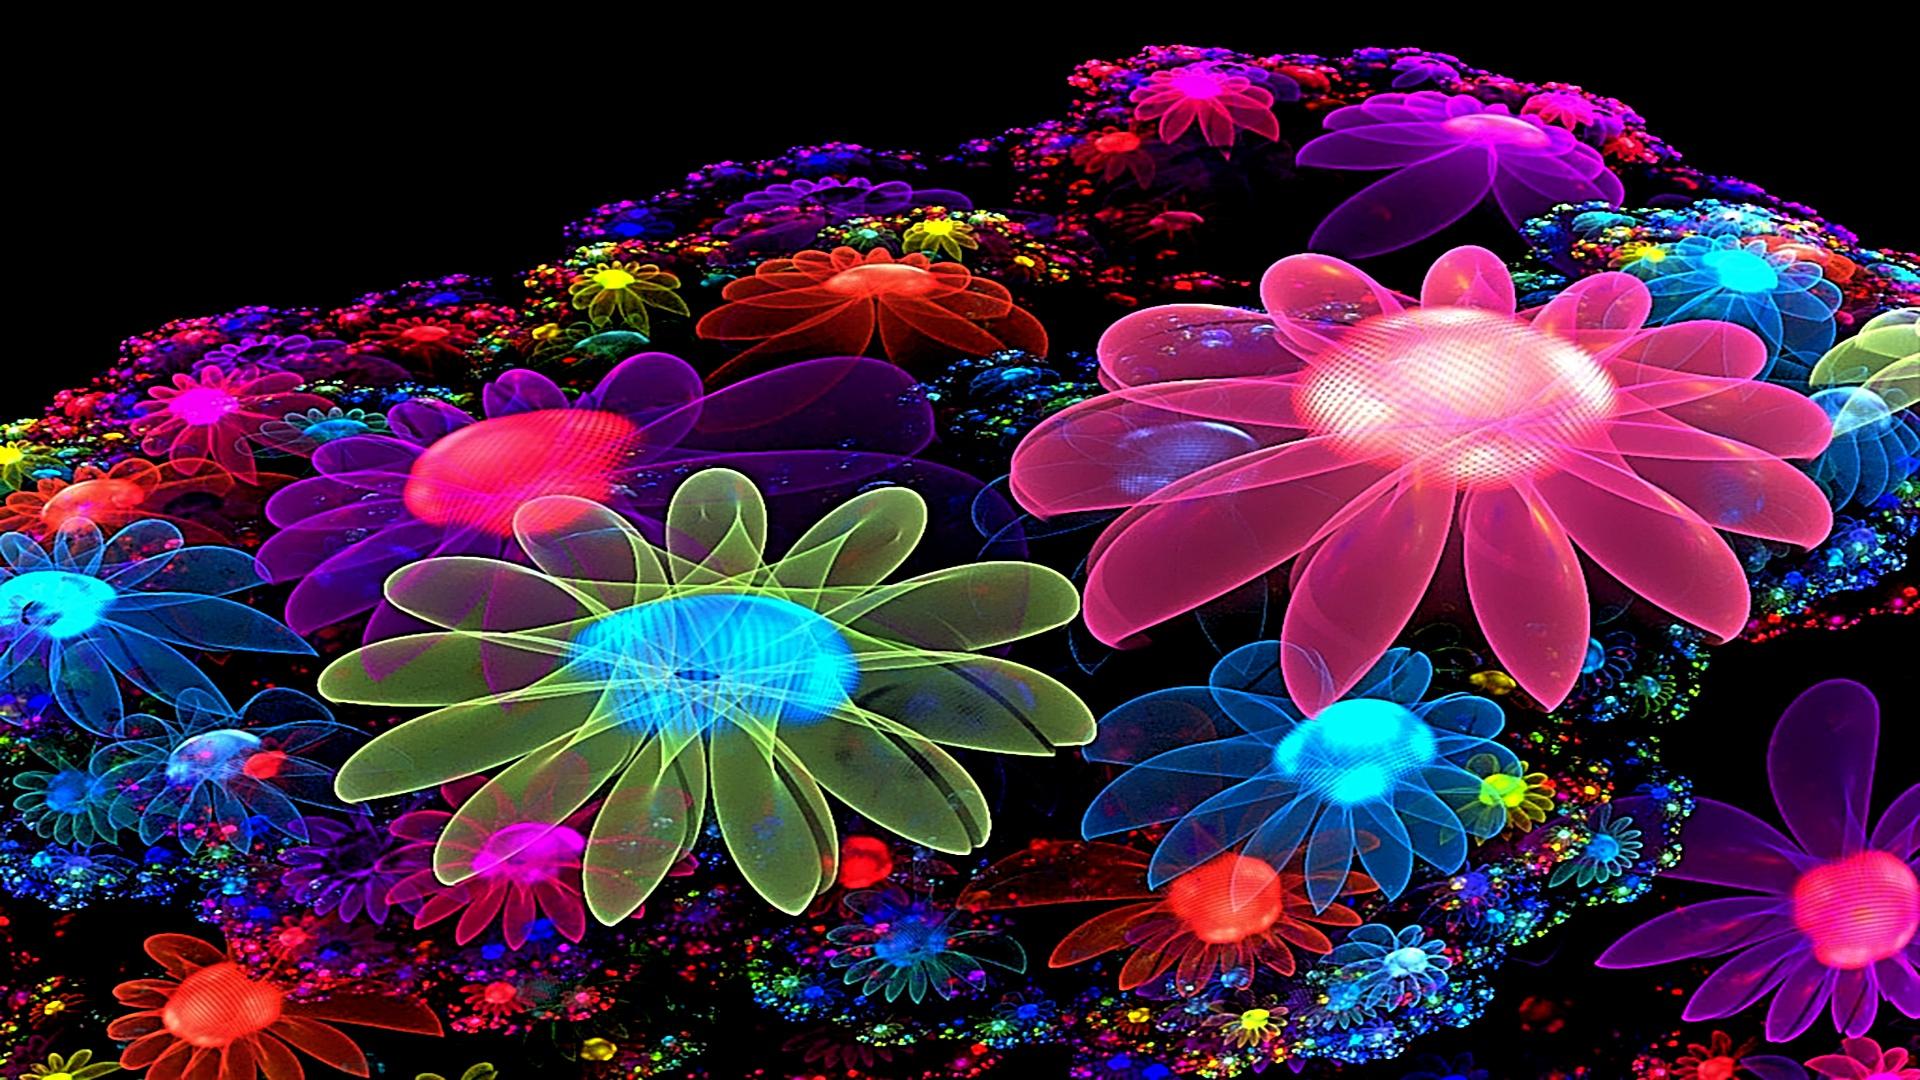 Colorful Flowers Desktop Wallpapers Images   HD Flowers Wallpaper 1920x1080